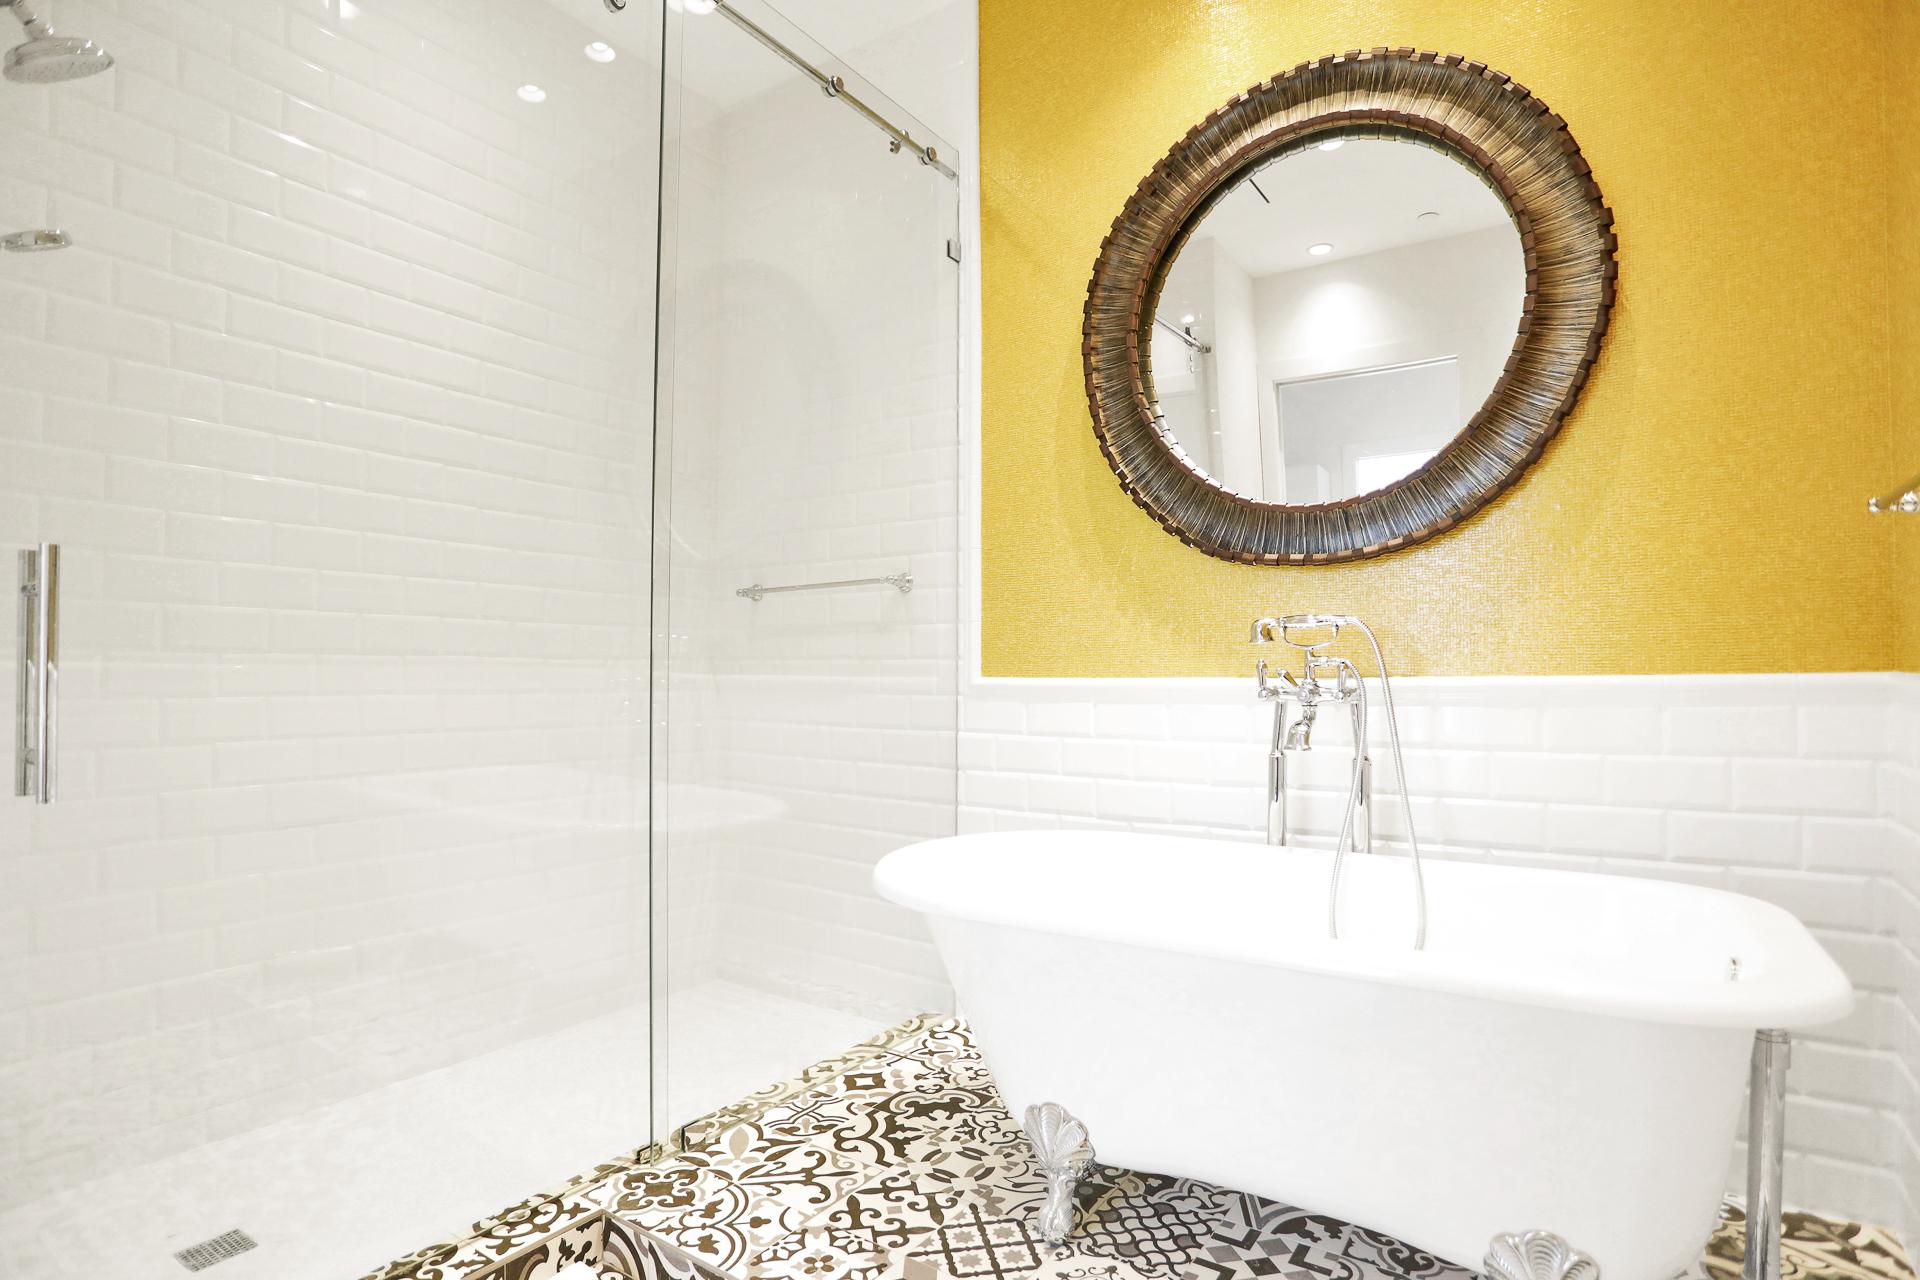 remodeled master bathroom with pedestal tub